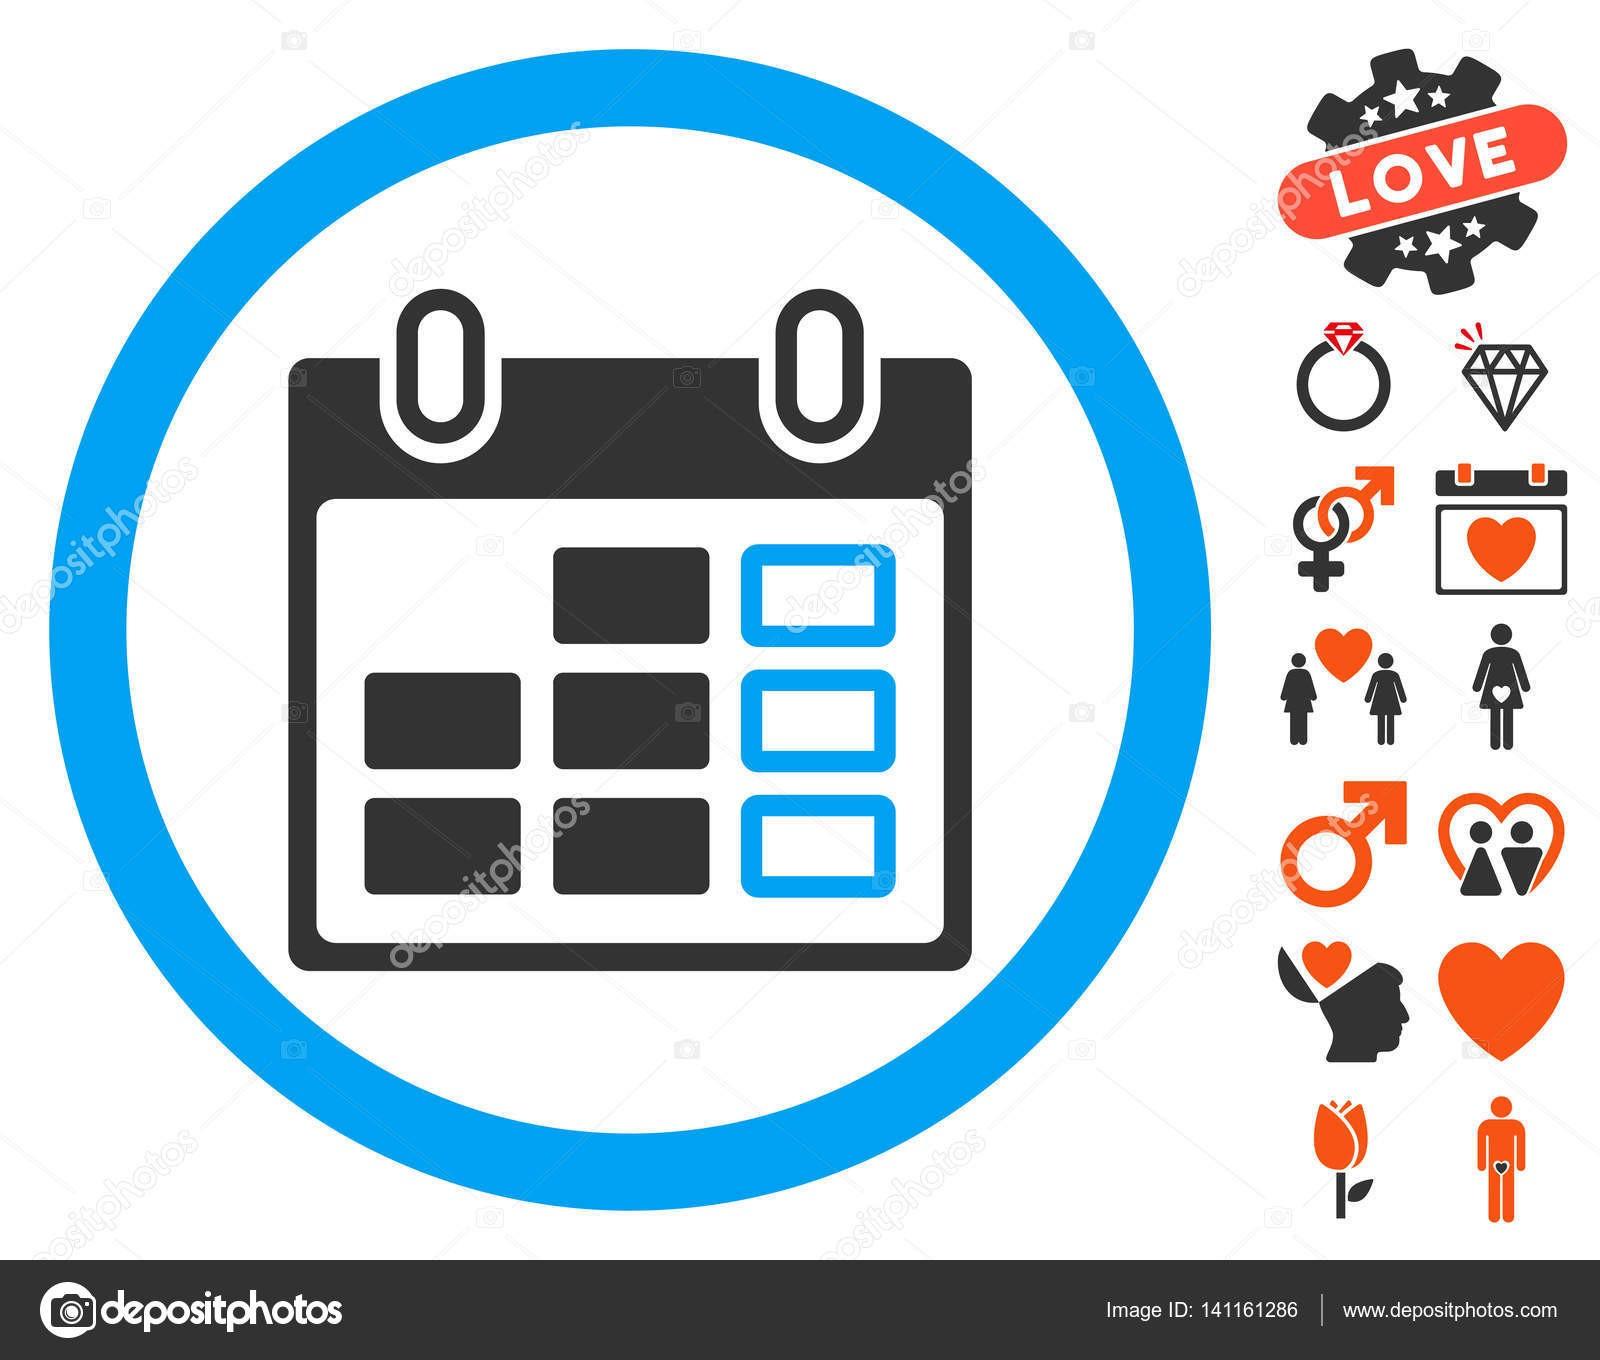 Pictograma de semana calendario con pictogramas de bono San Valentn Vector ilustraci³n estilo es plano ic³nicos smbolos para dise±o web interfaces de